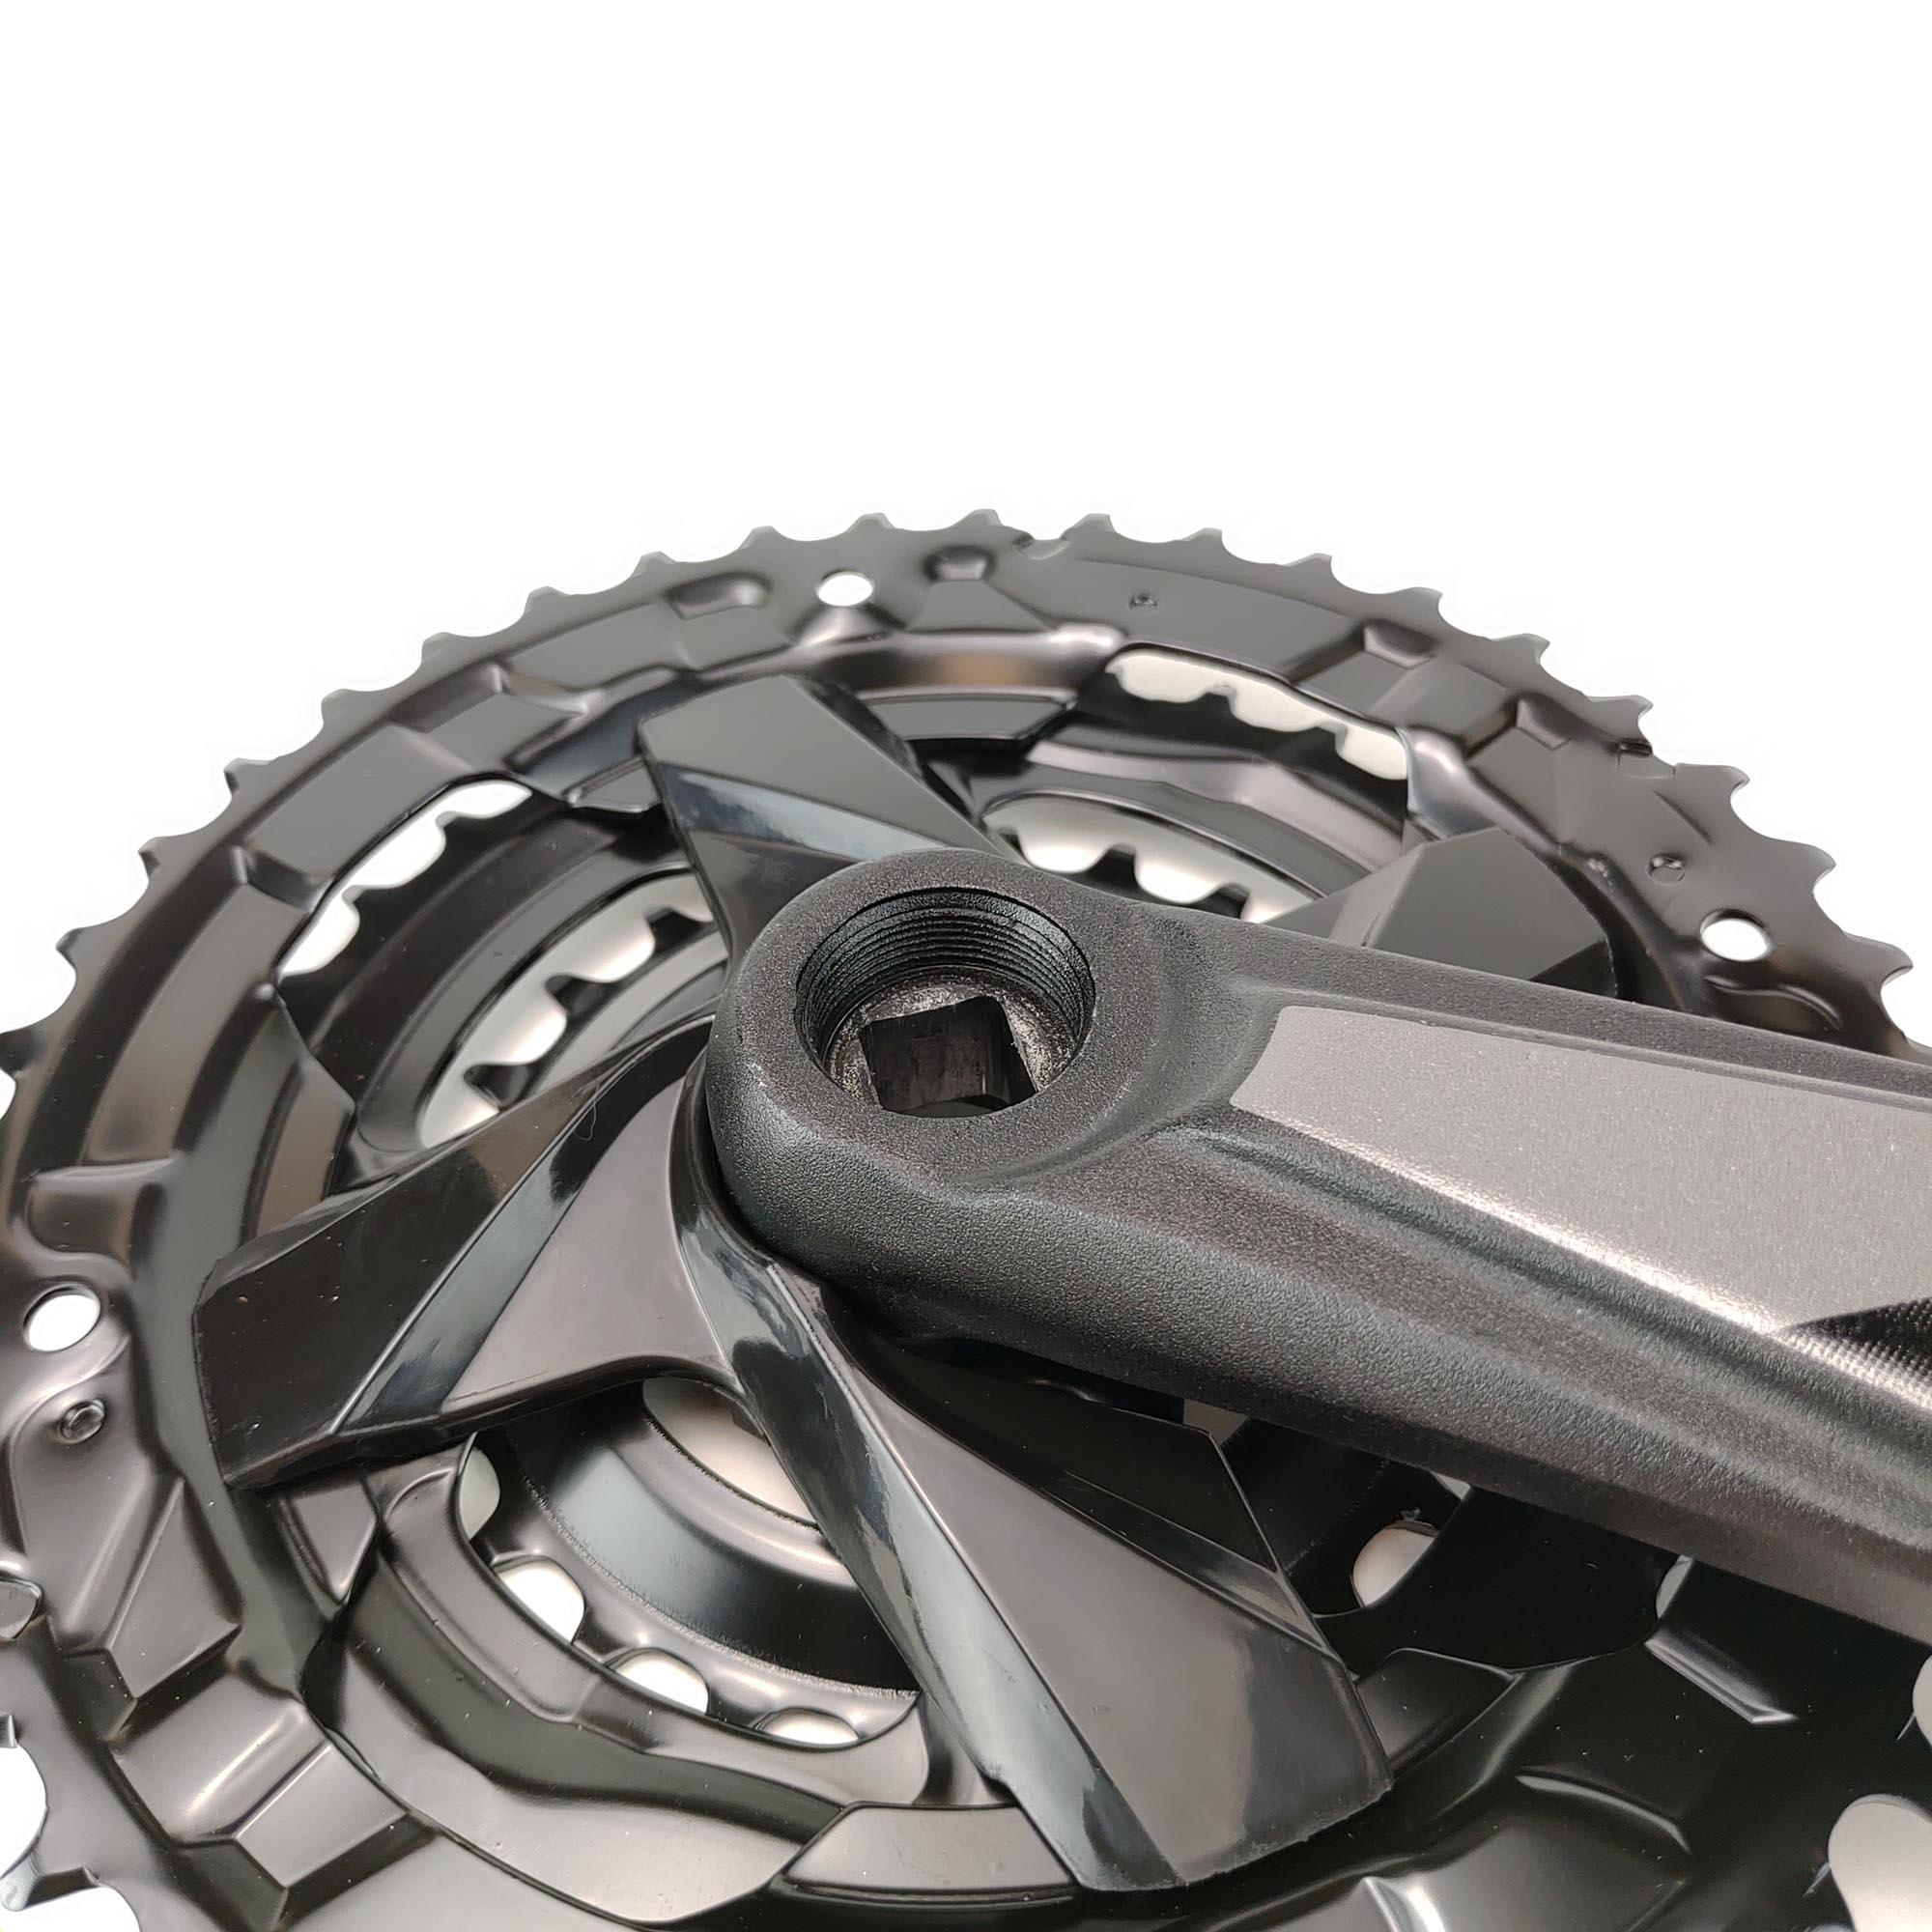 Pedivela Bike Triplo Ltx Aluminio 24_34_42 Grafite Sem Protetor